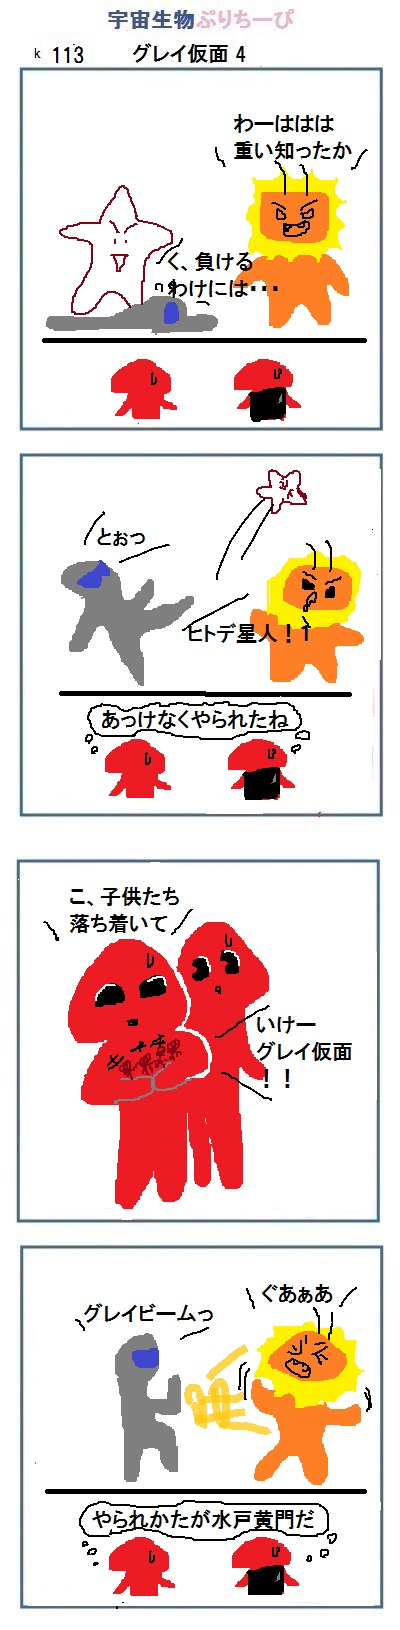 160926_k113.jpg